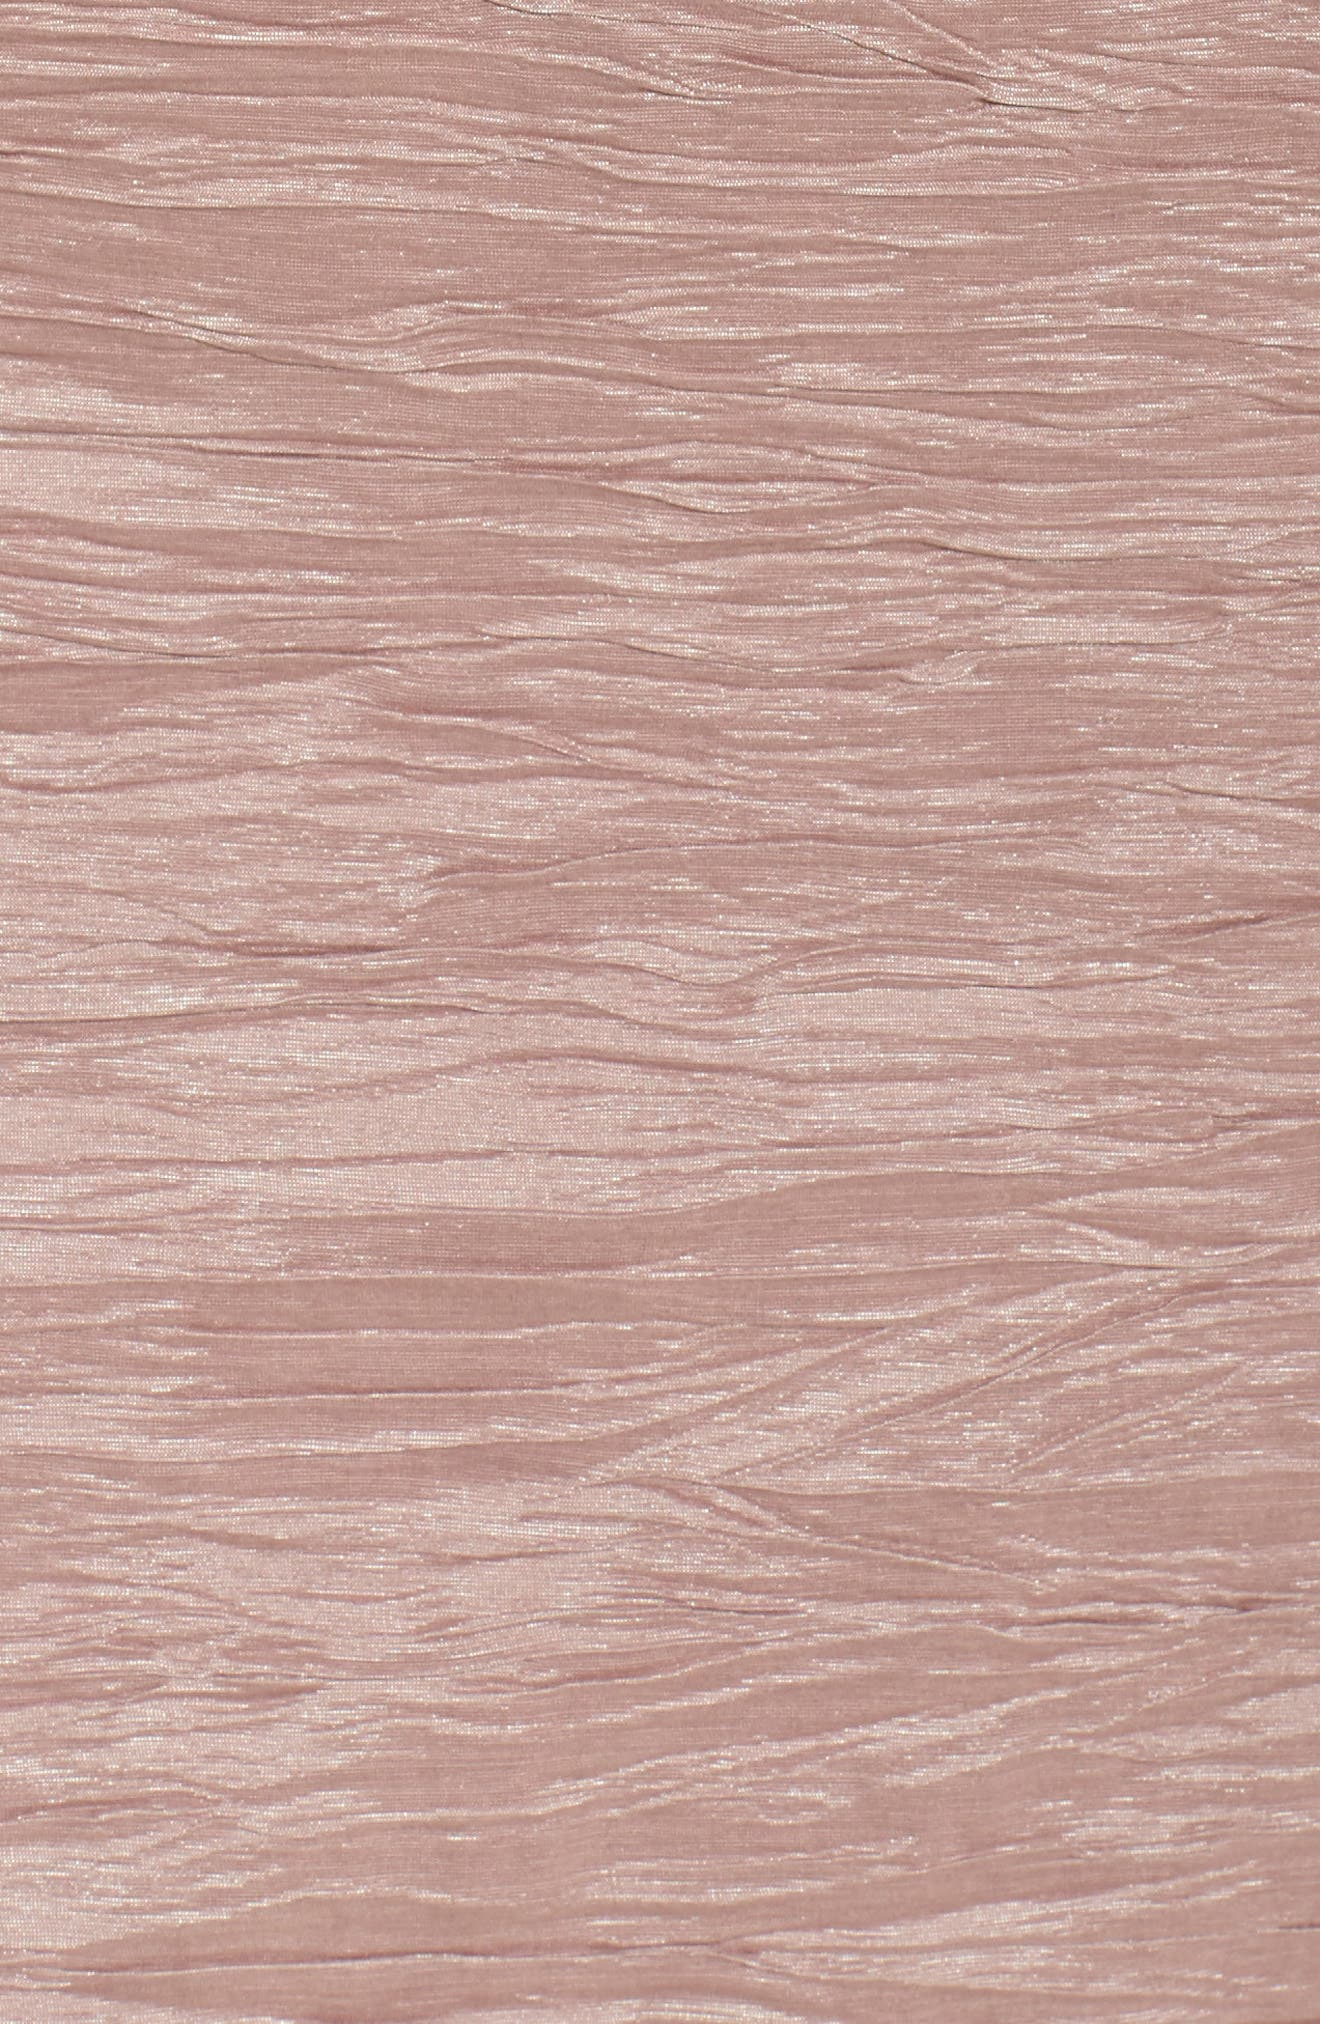 Metallic Sheath Dress,                             Alternate thumbnail 10, color,